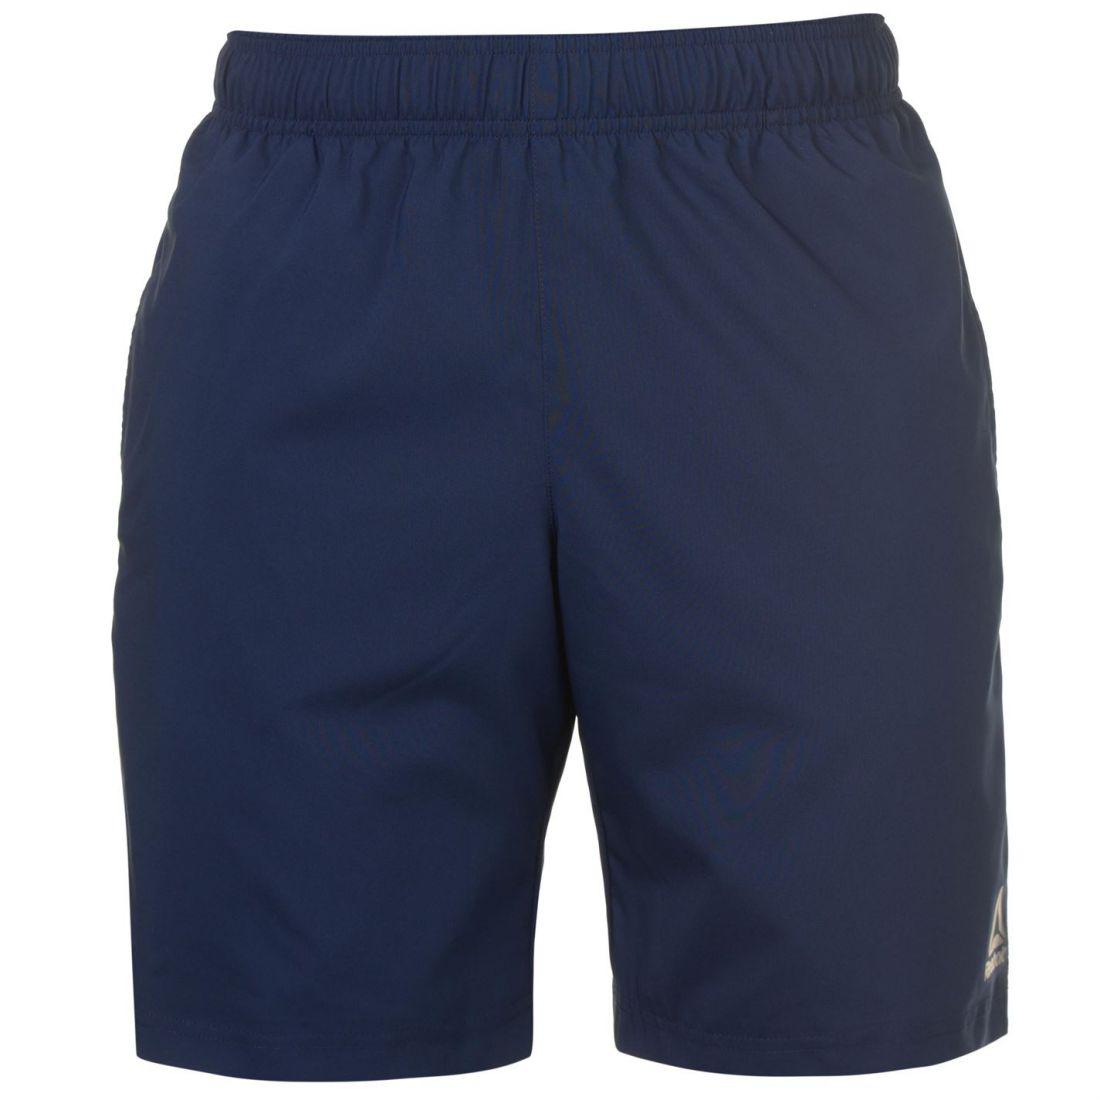 2dee19310ca2 Reebok Mens Workout Shorts Poly Pants Trousers Bottoms Lightweight ...